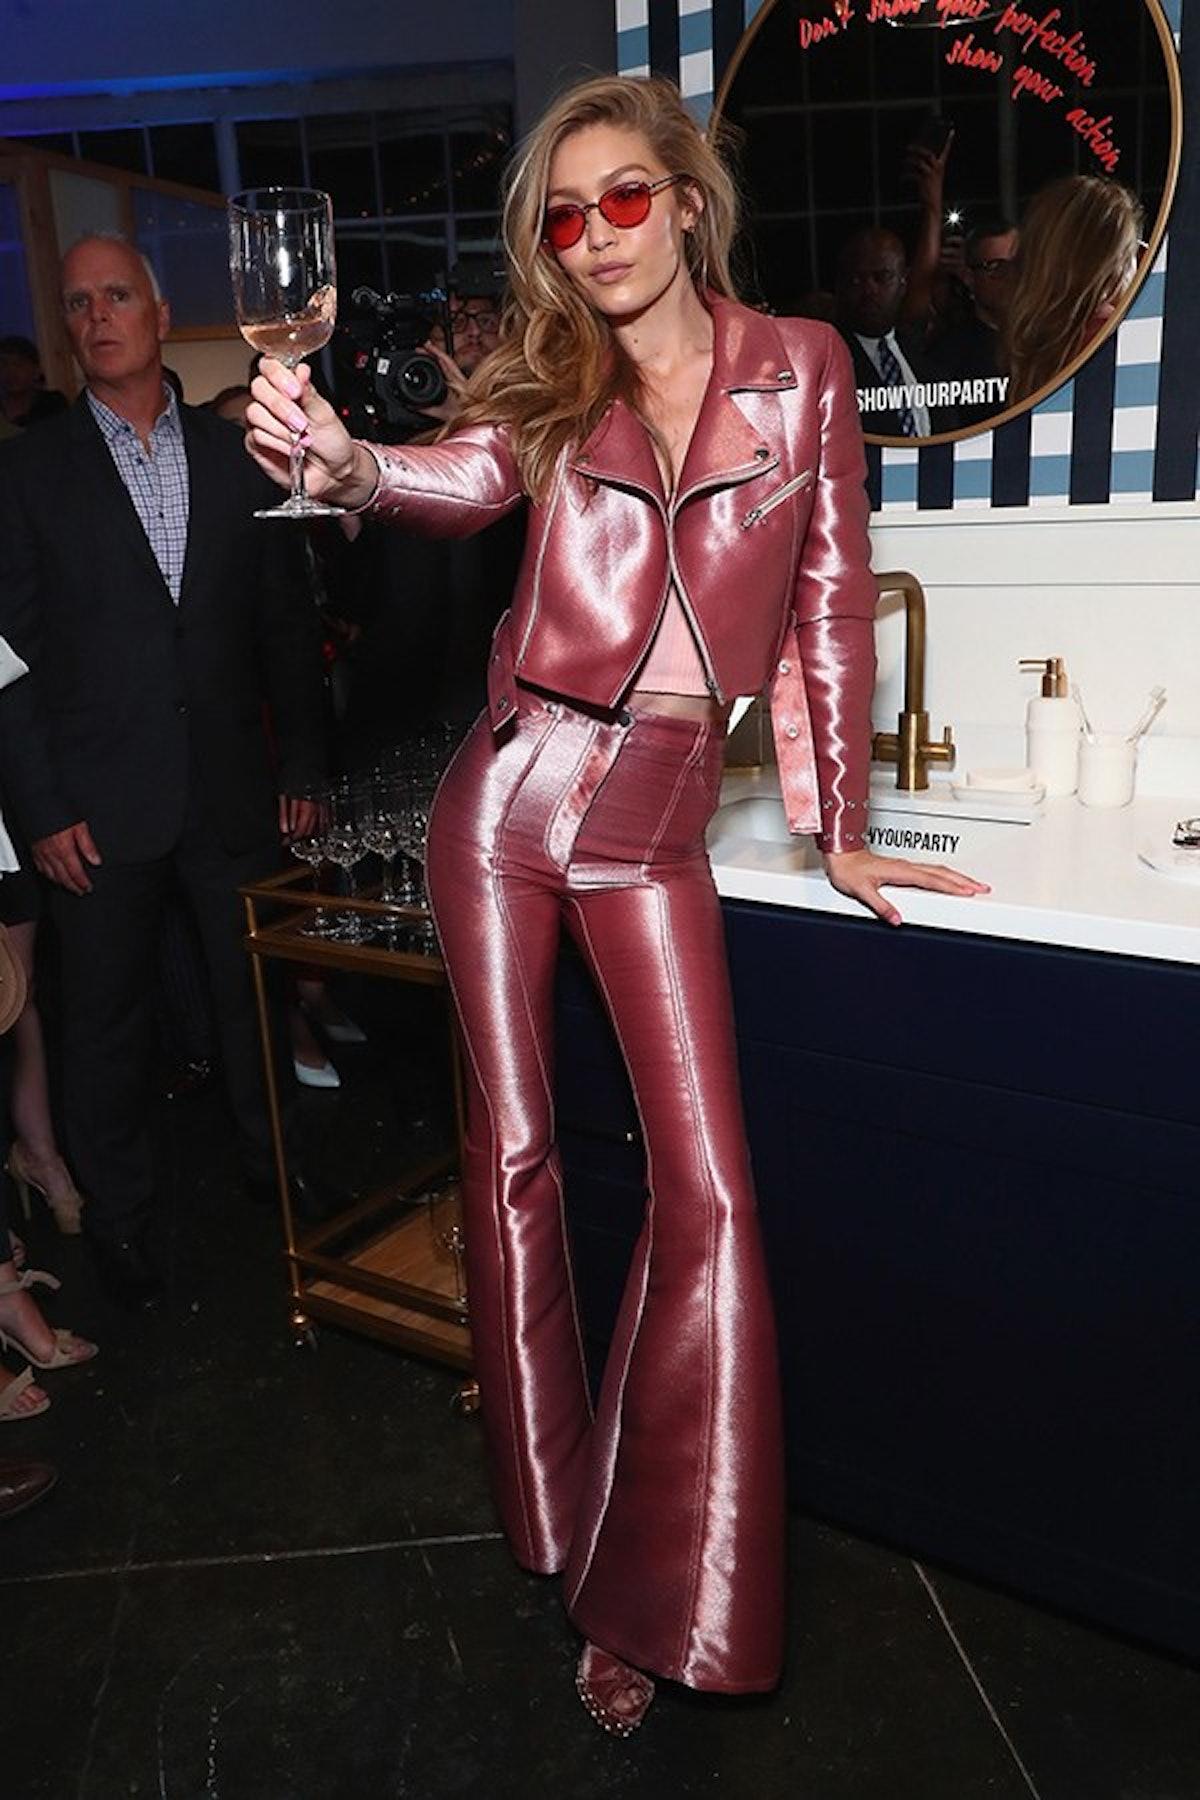 Gigi Hadid for Vogue Eyewear #ShowYourParty Event